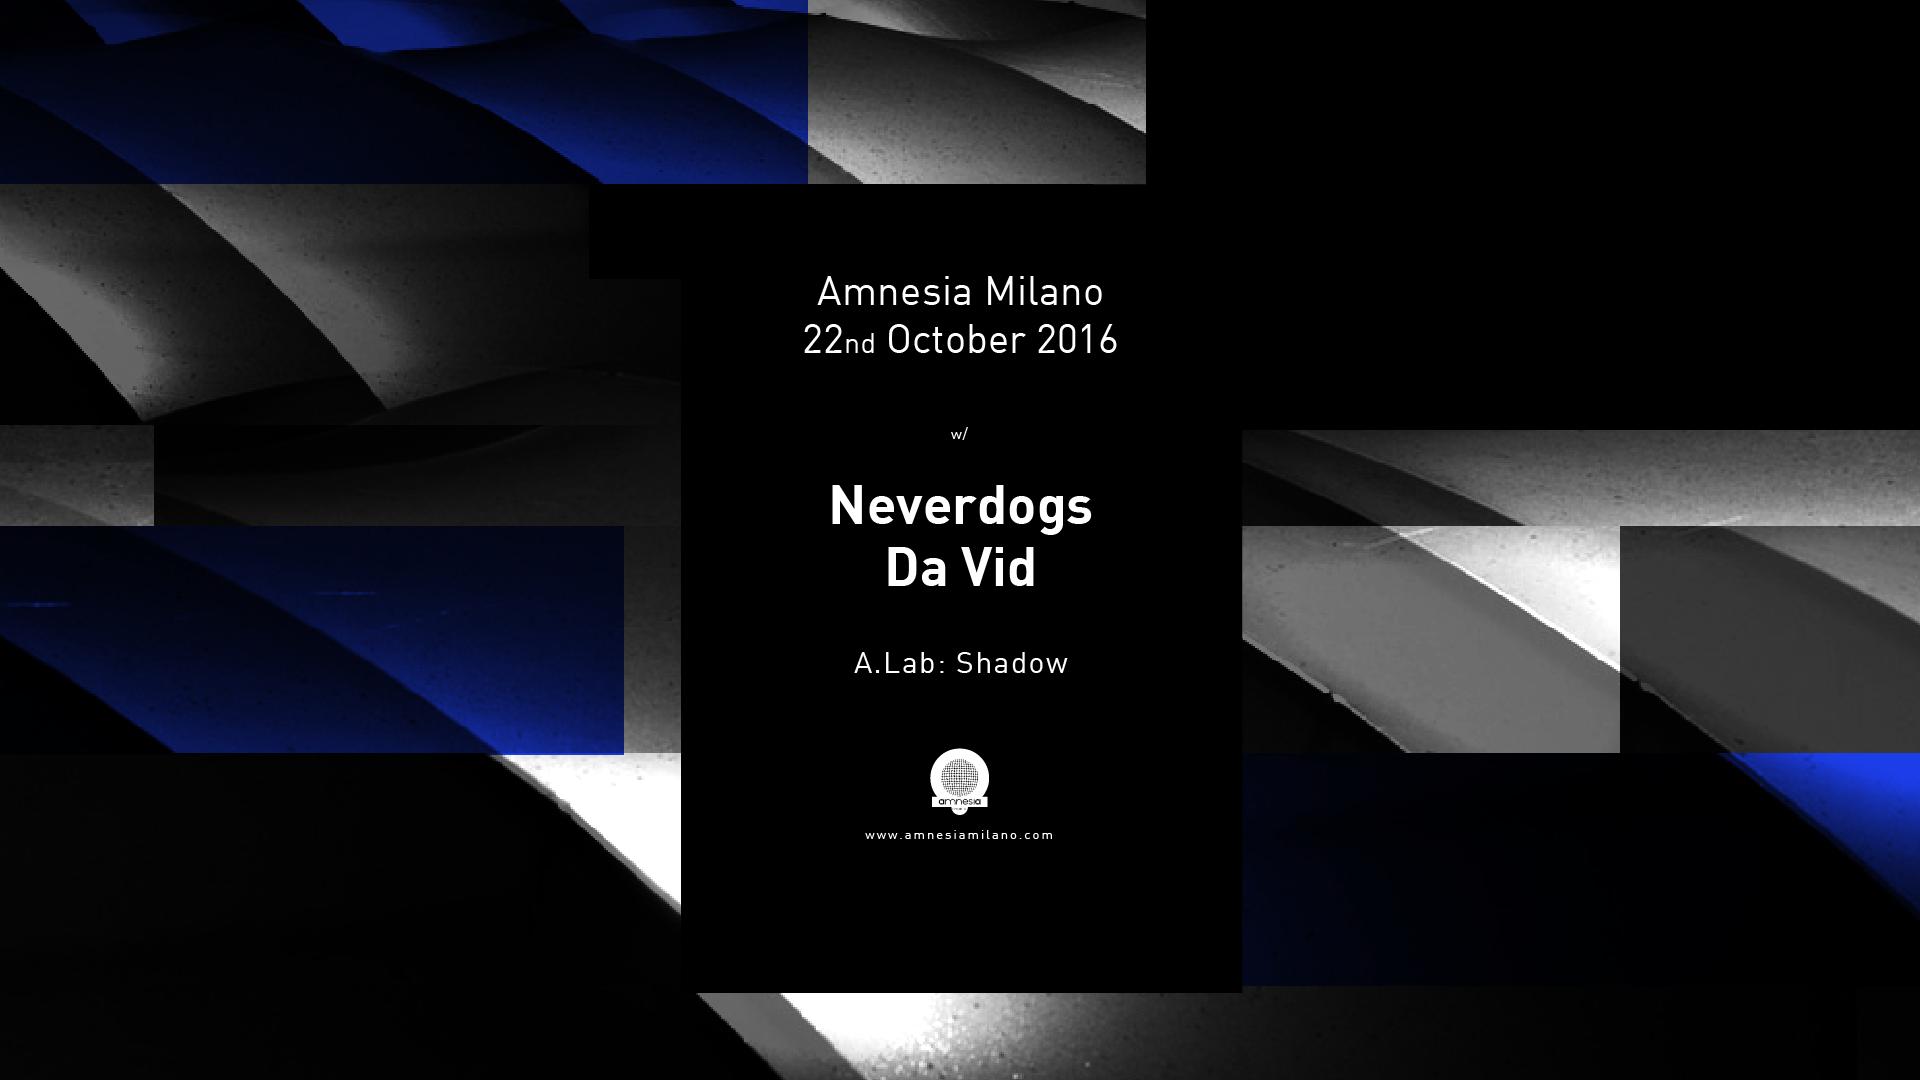 Amnesia-milano-22-ottobre-2016